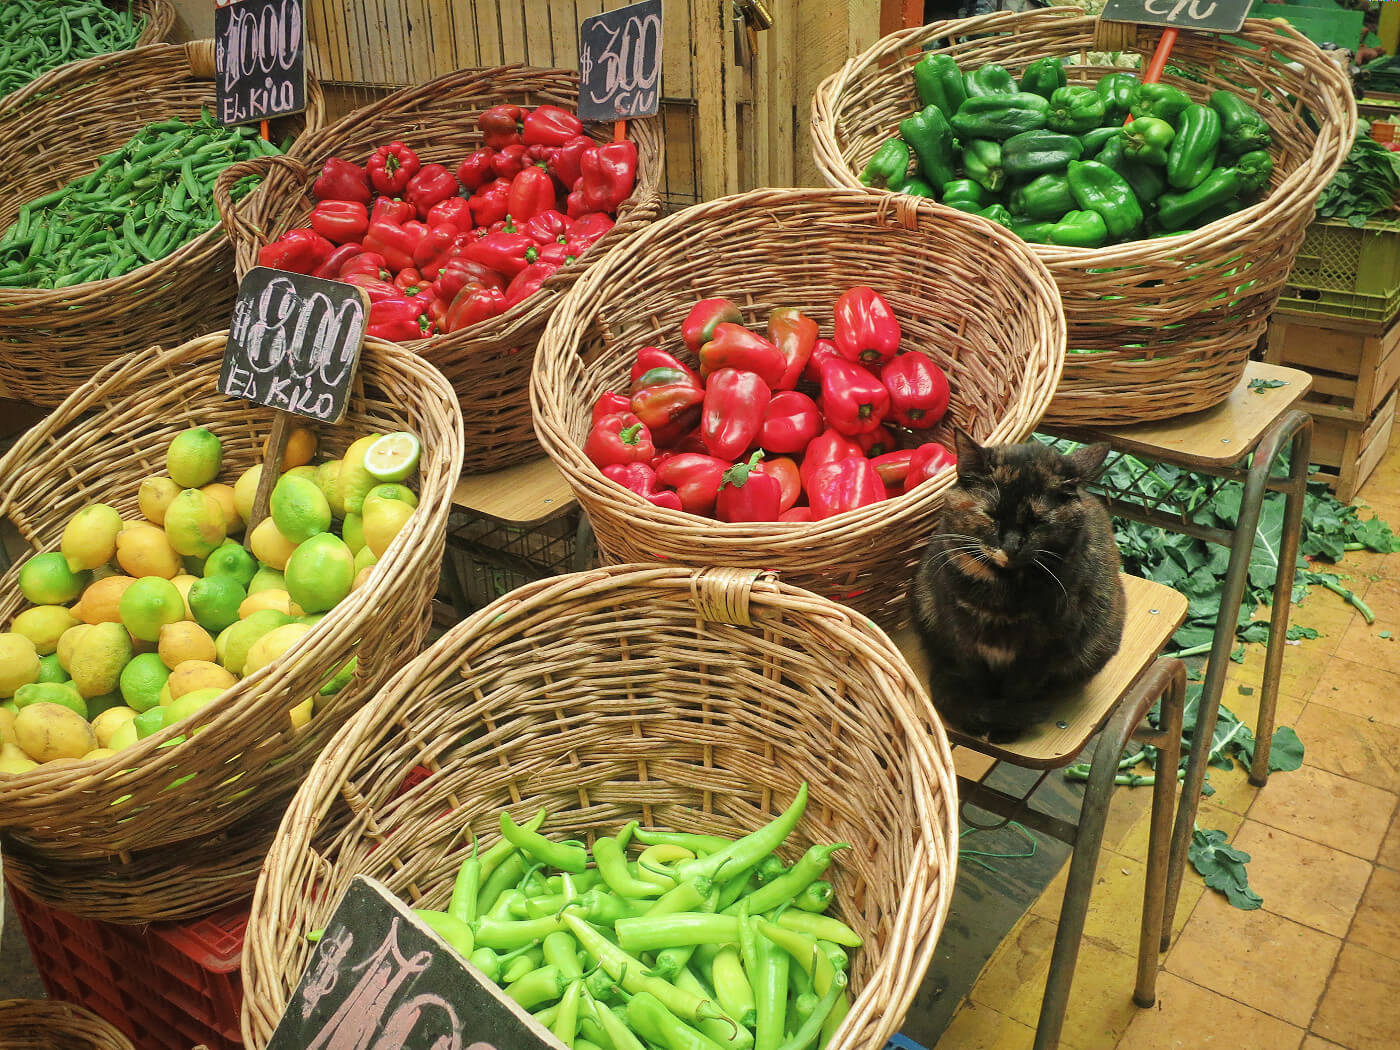 Cat in a mercado stall in Valparaiso, Chile.